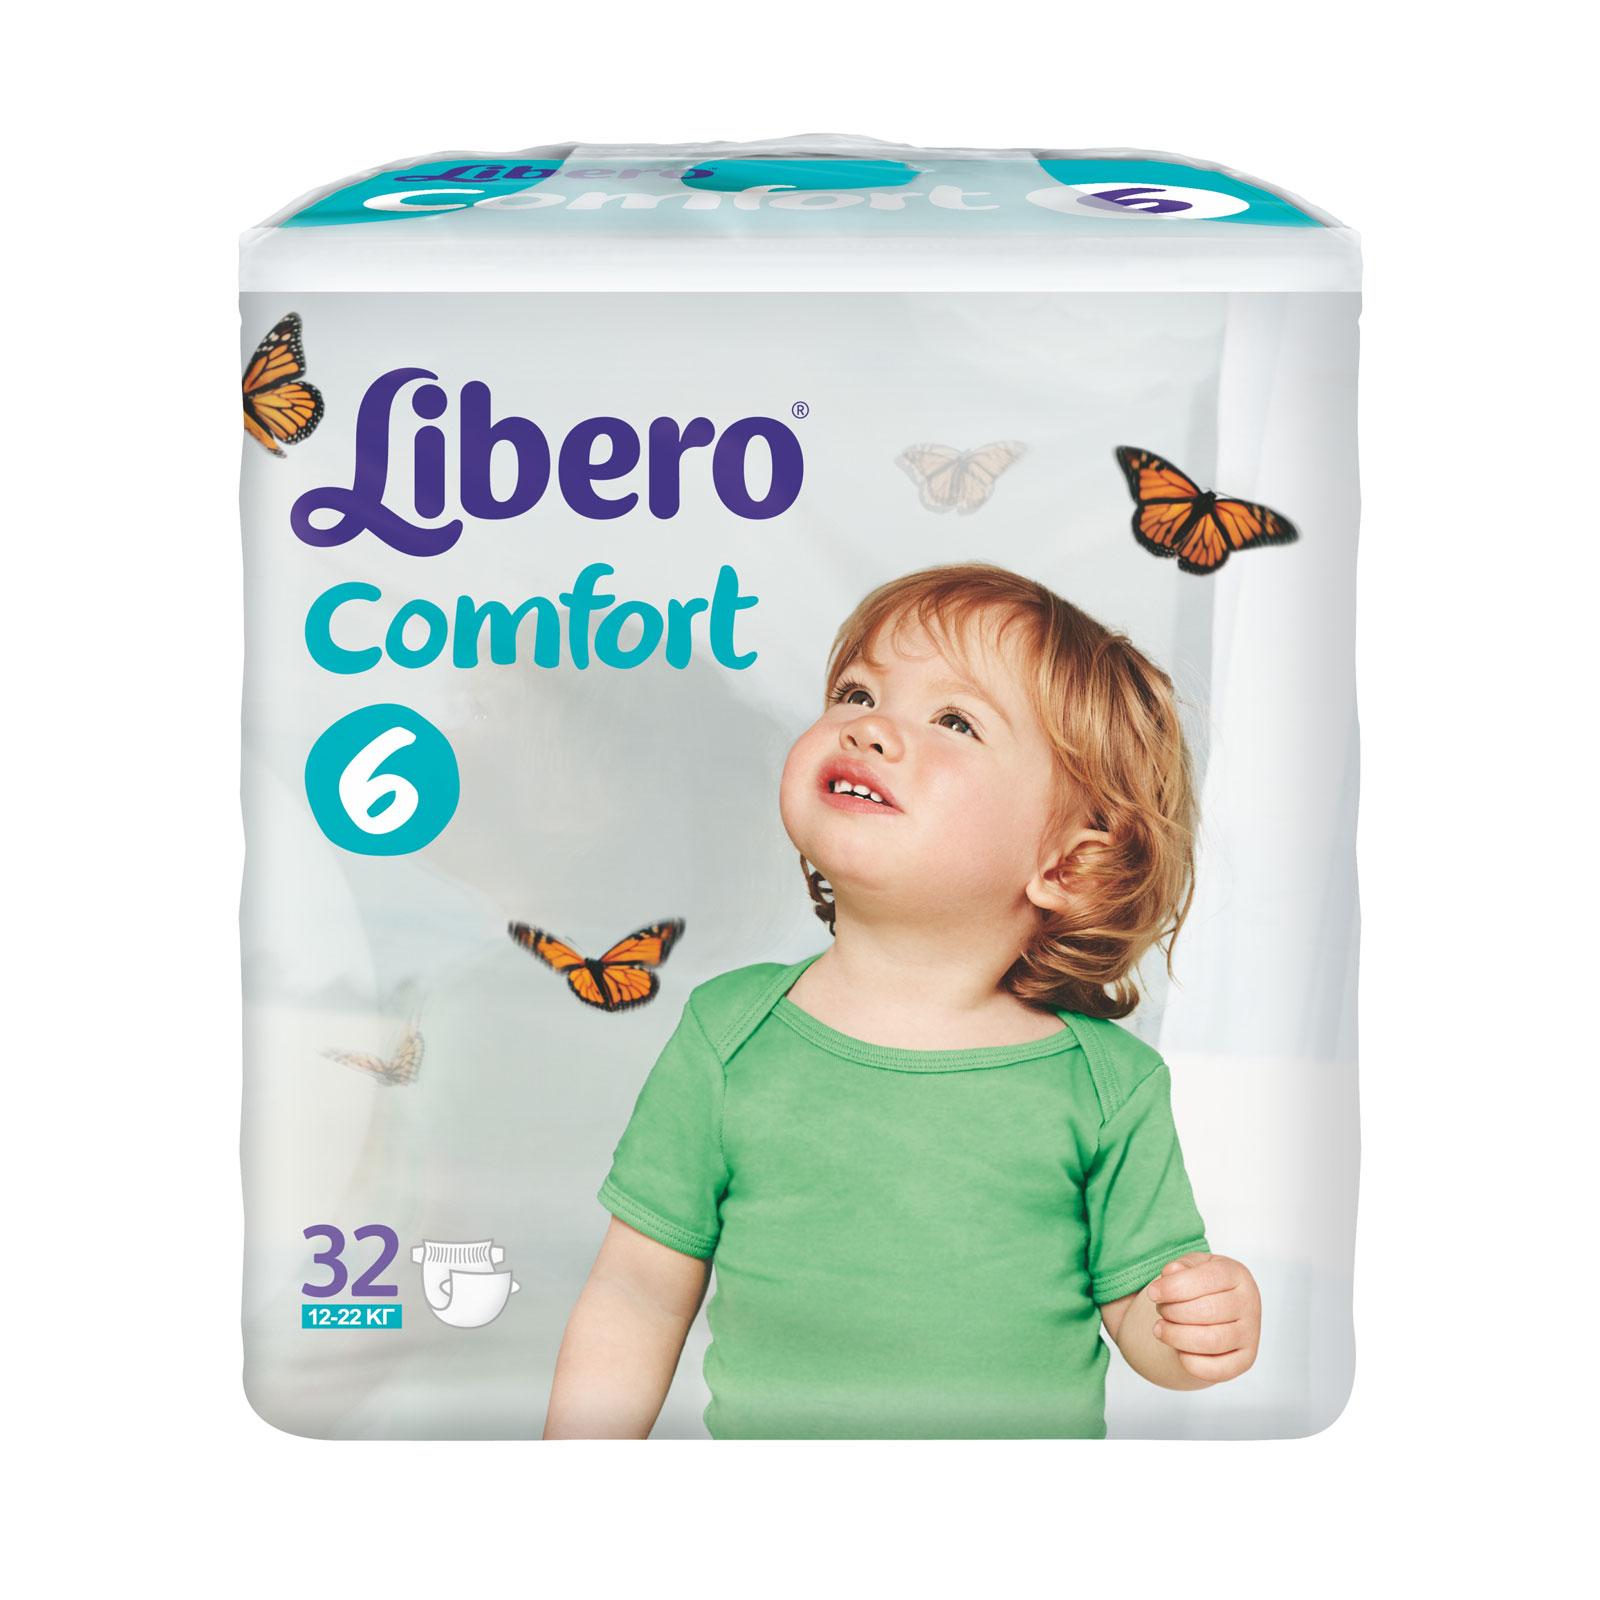 "���������� Libero ""Comfort"" Extra large 12-22 ��. (32 ��.) ������ 6"